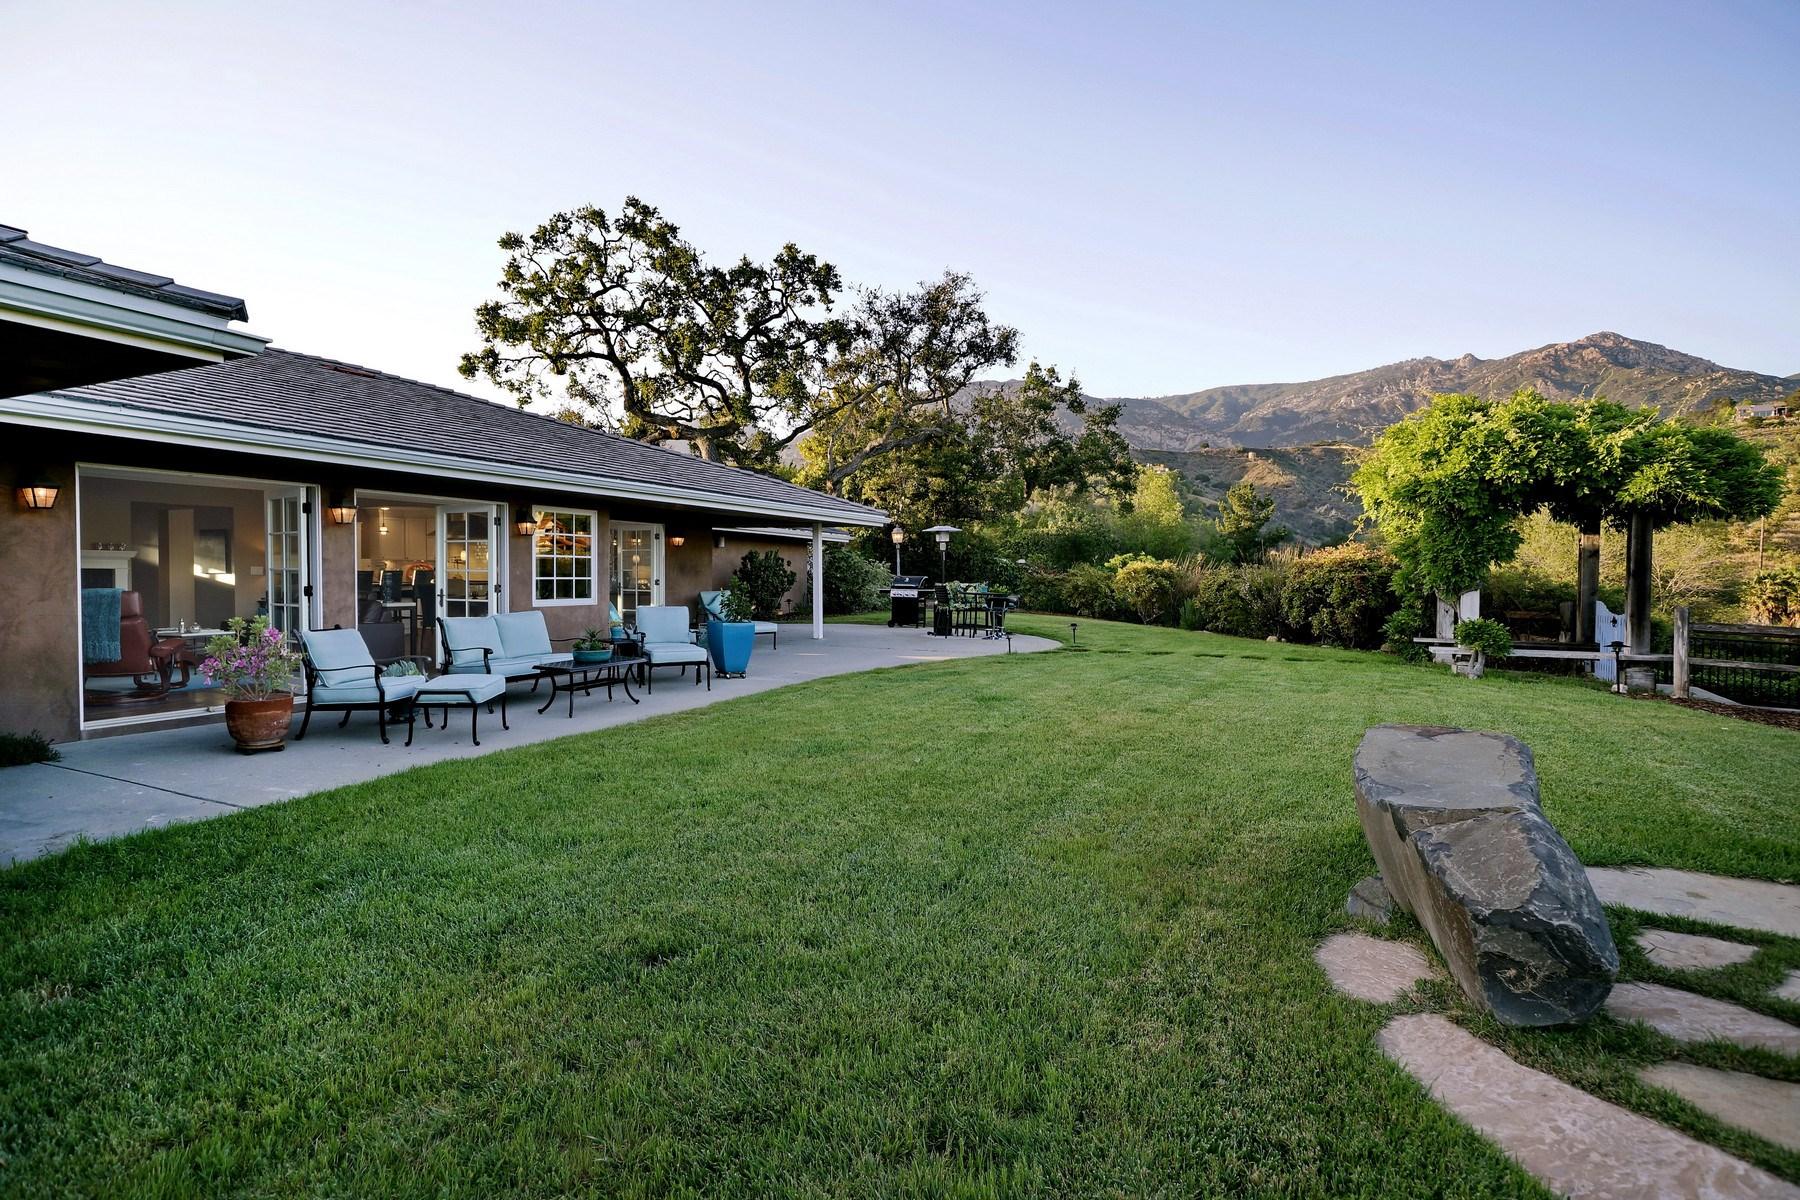 独户住宅 为 销售 在 Impeccable Santa Barbara Living 108 Northridge Road 圣巴巴拉市, 加利福尼亚州, 93105 美国